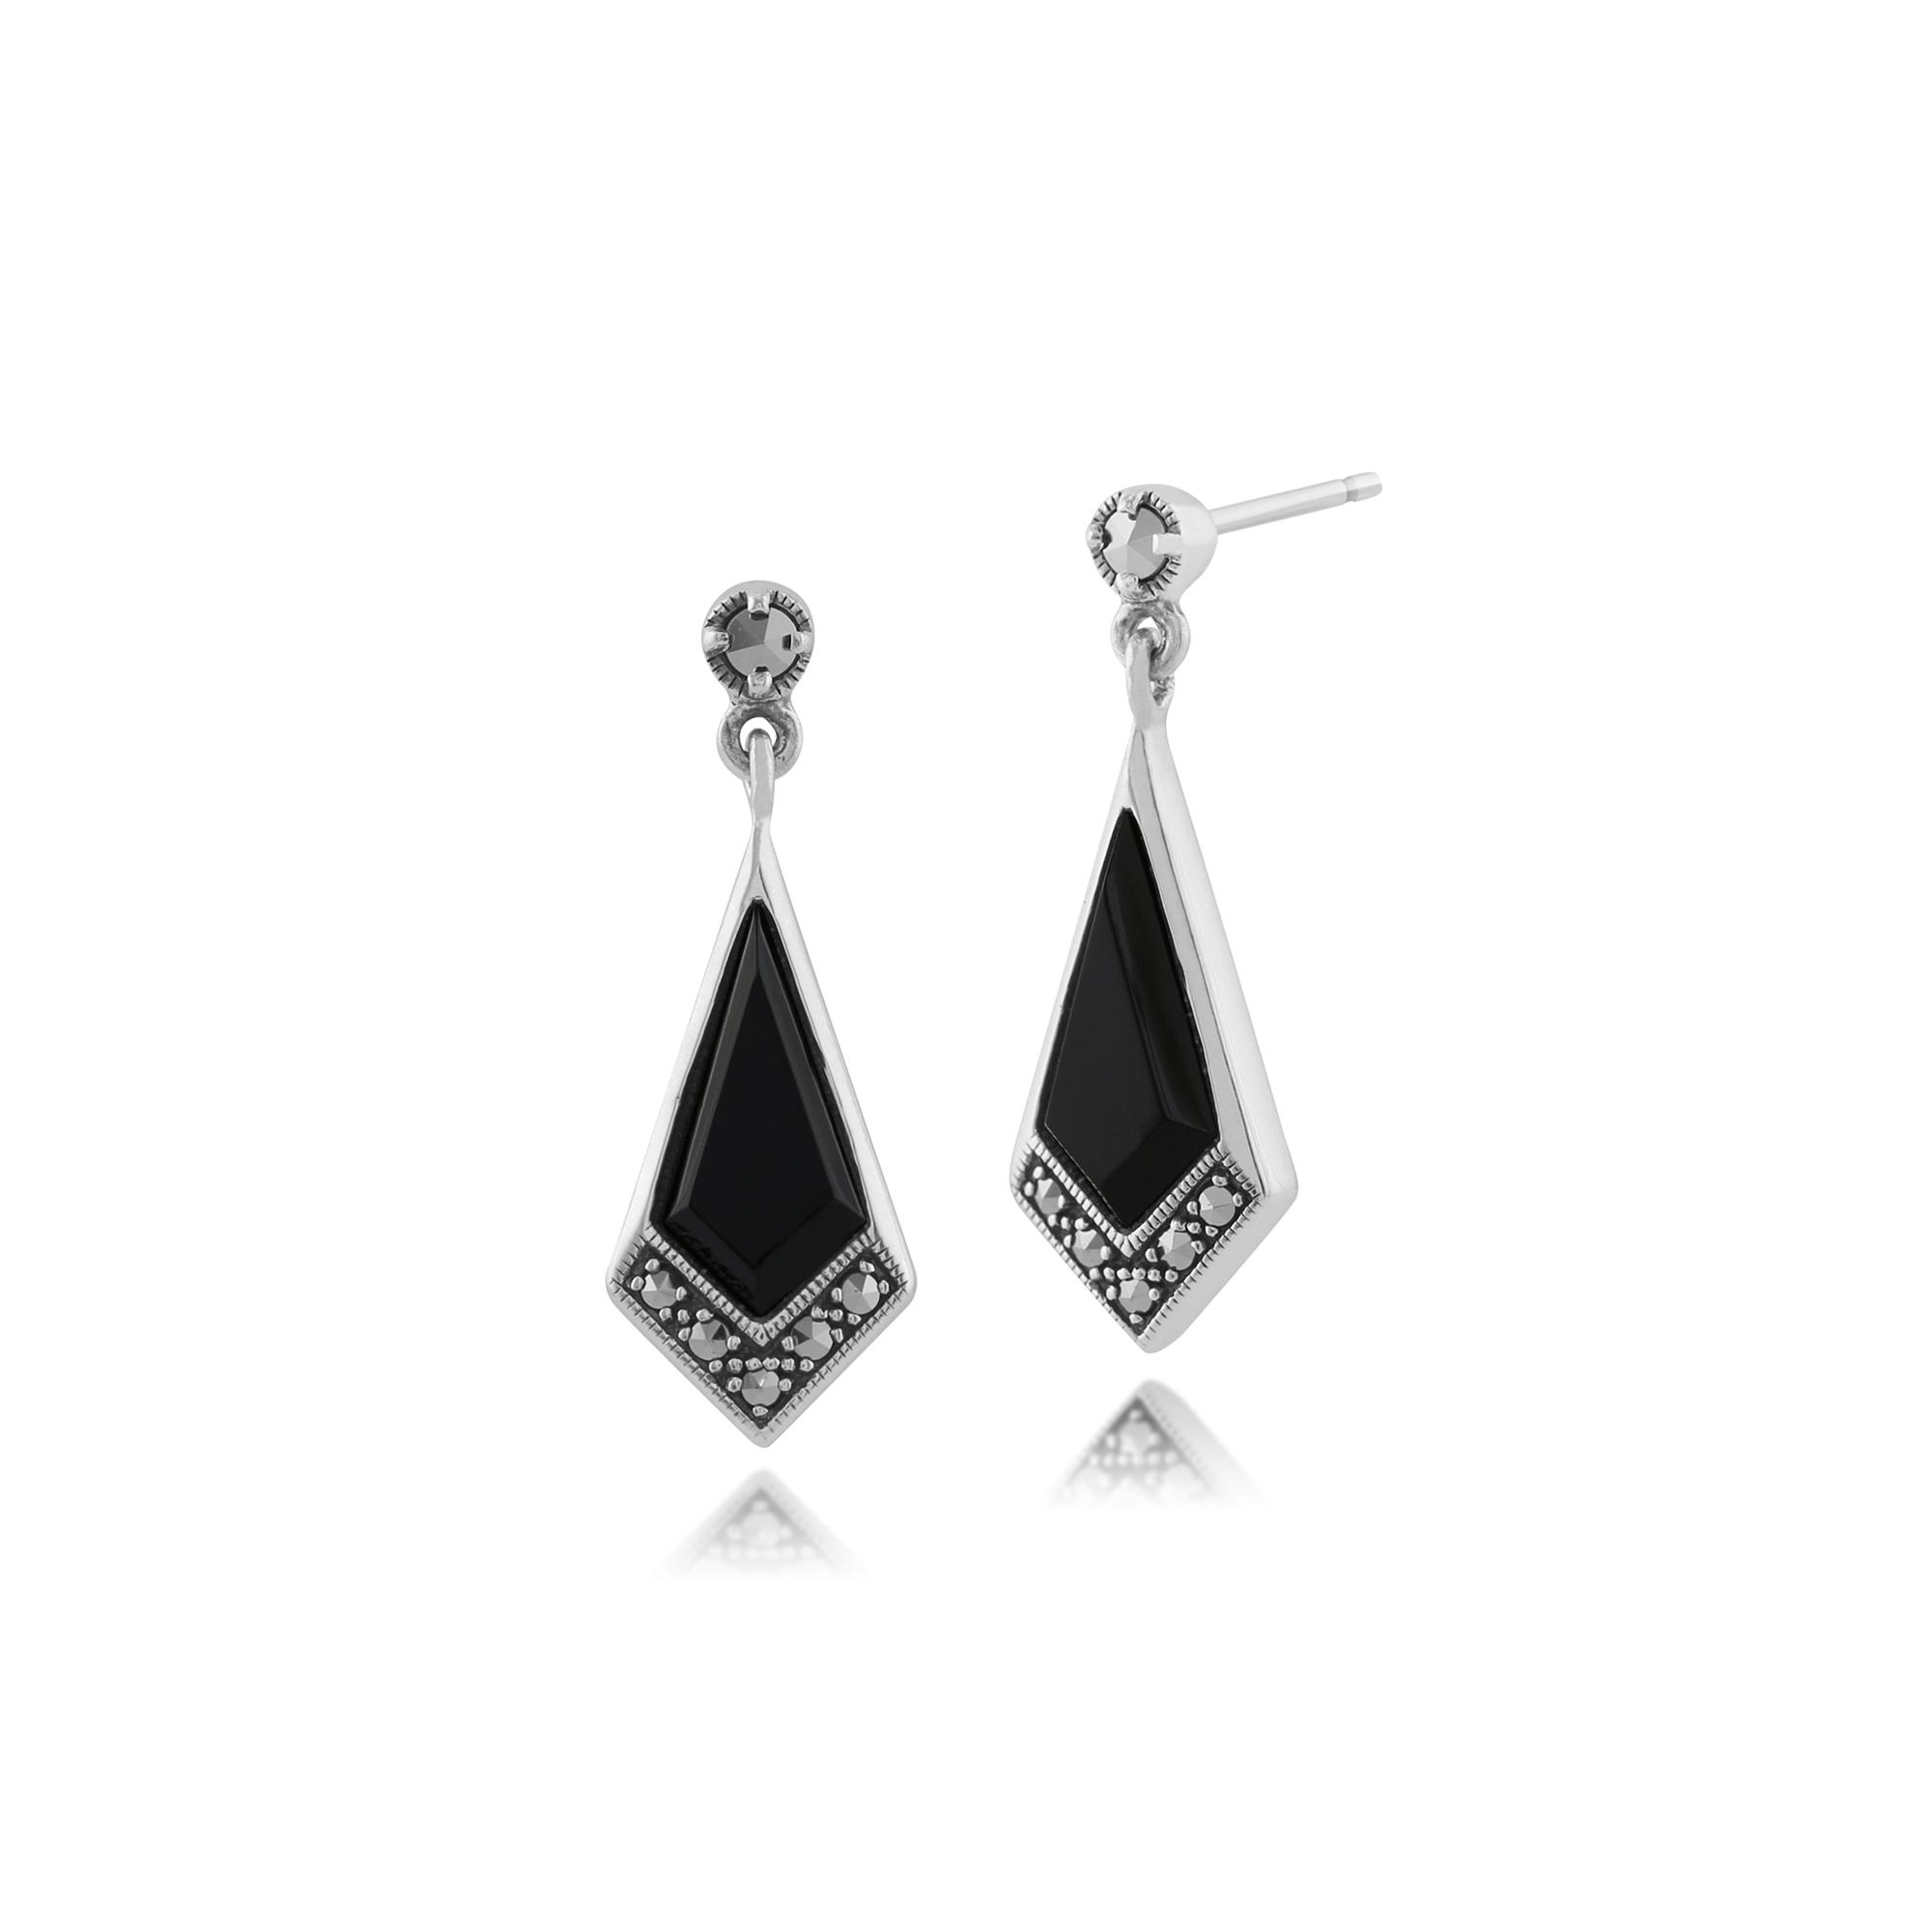 gemondo 925 sterling silver 2ct black onyx marcasite art deco drop earrings. Black Bedroom Furniture Sets. Home Design Ideas